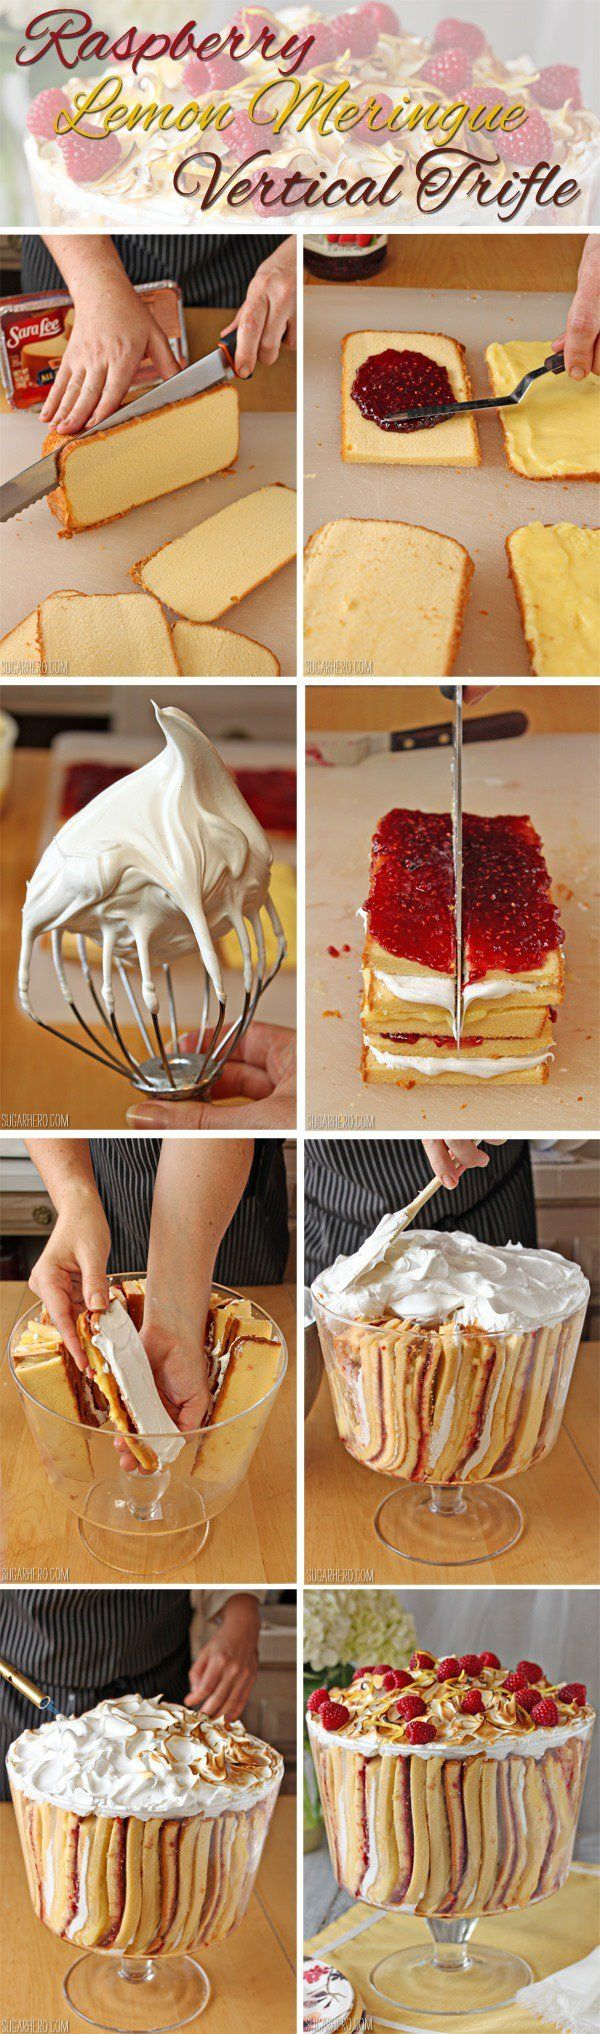 How to Make Raspberry Lemon Meringue Trifle | SugarHero.com